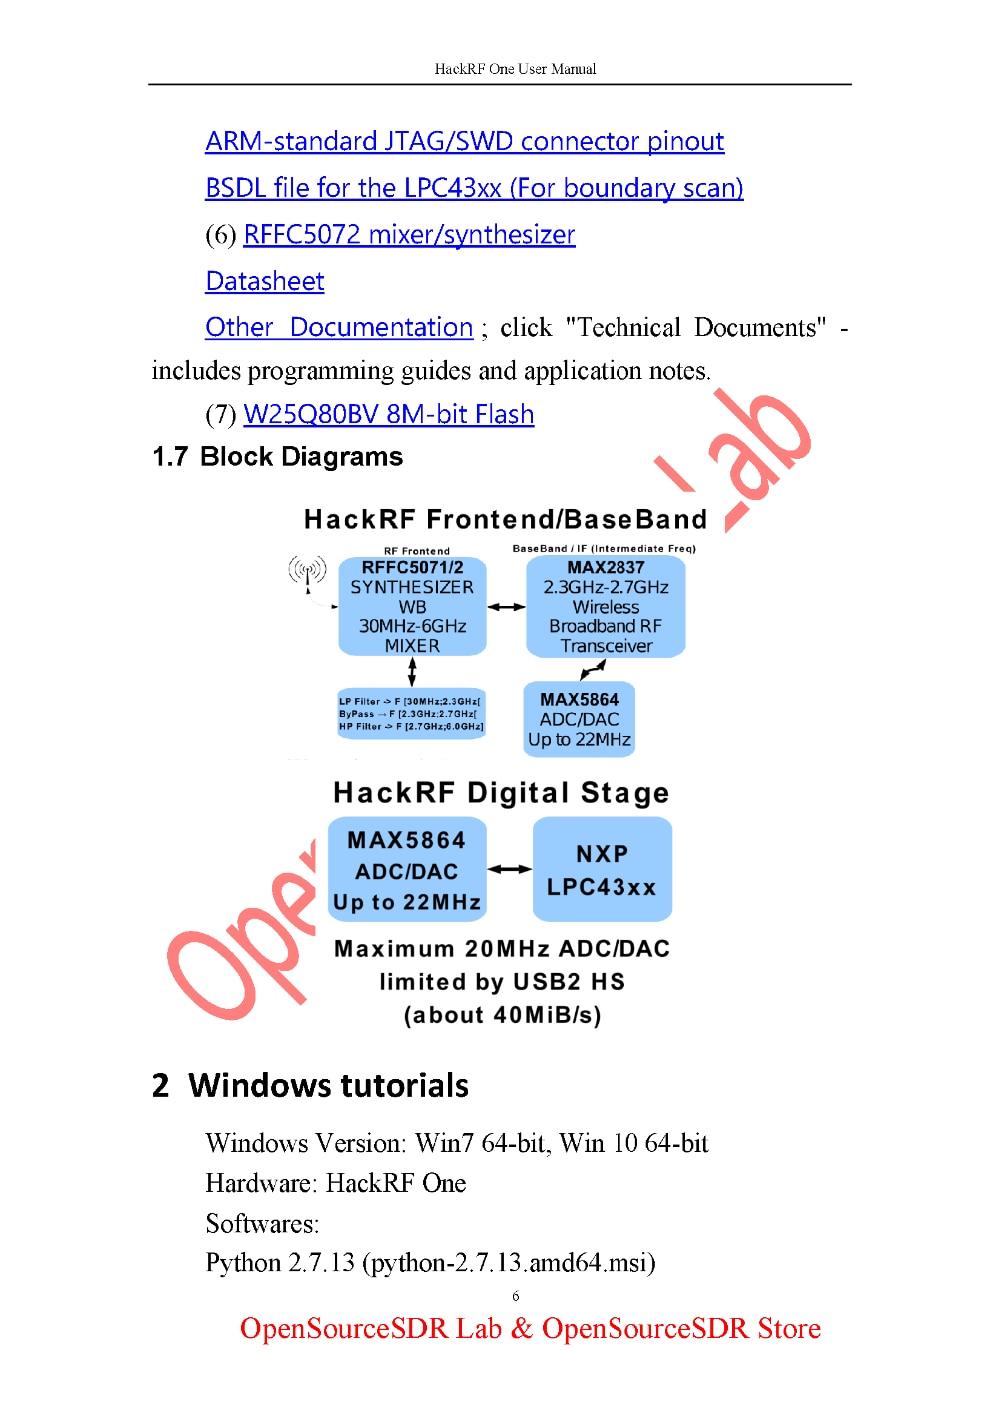 HackRF One User Manual_页面_08